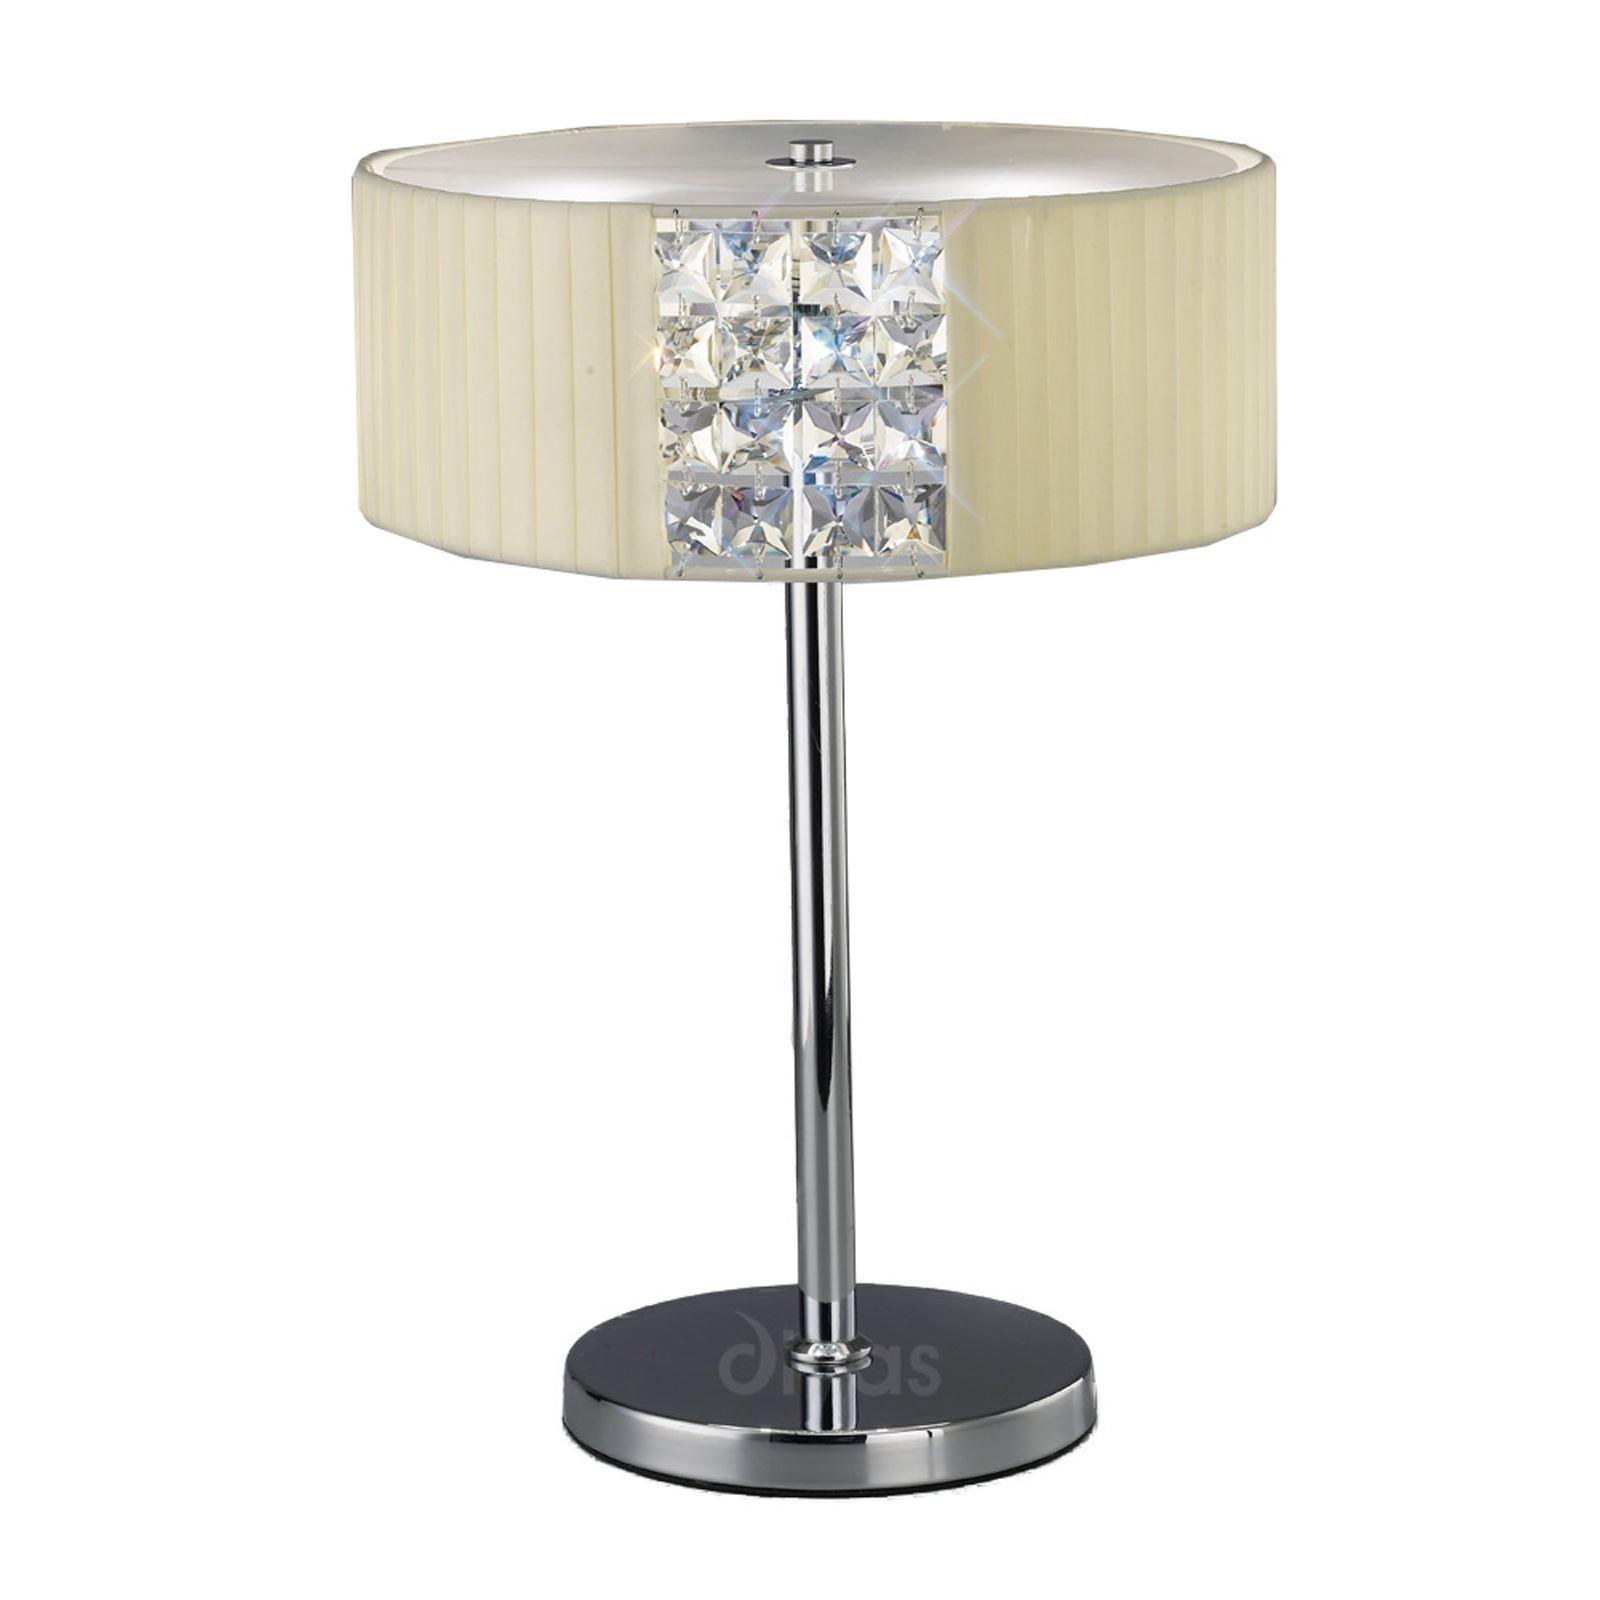 Cream Shade 2 Light Crystal Round Table Lamp - Polished Chrome